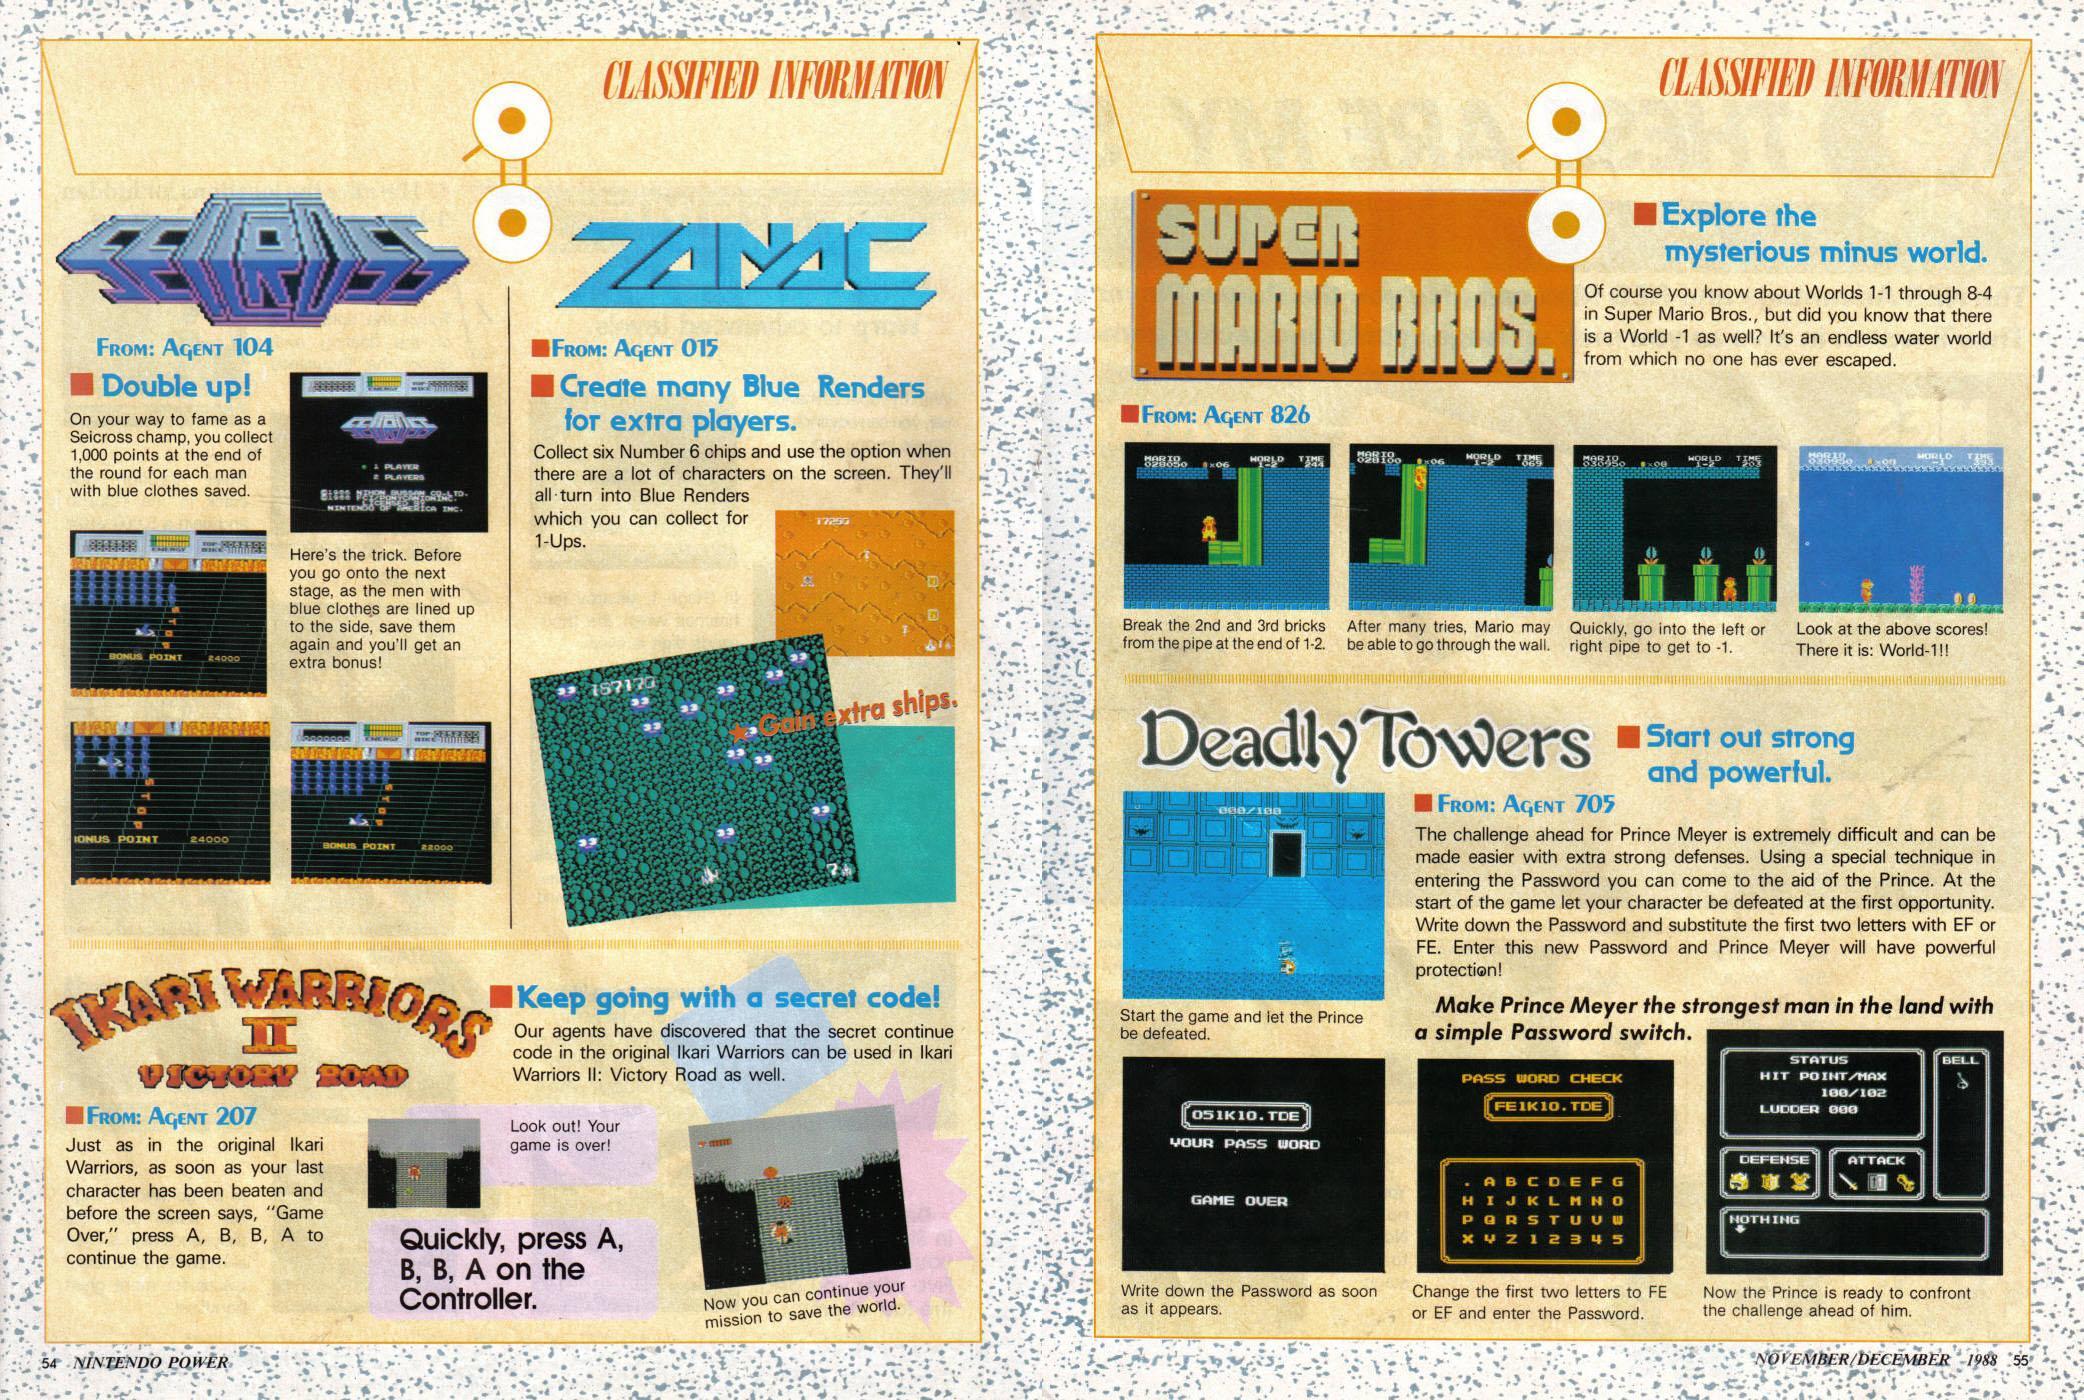 Super Mario Bros  (NES) saviour of videogames & Nintendo's